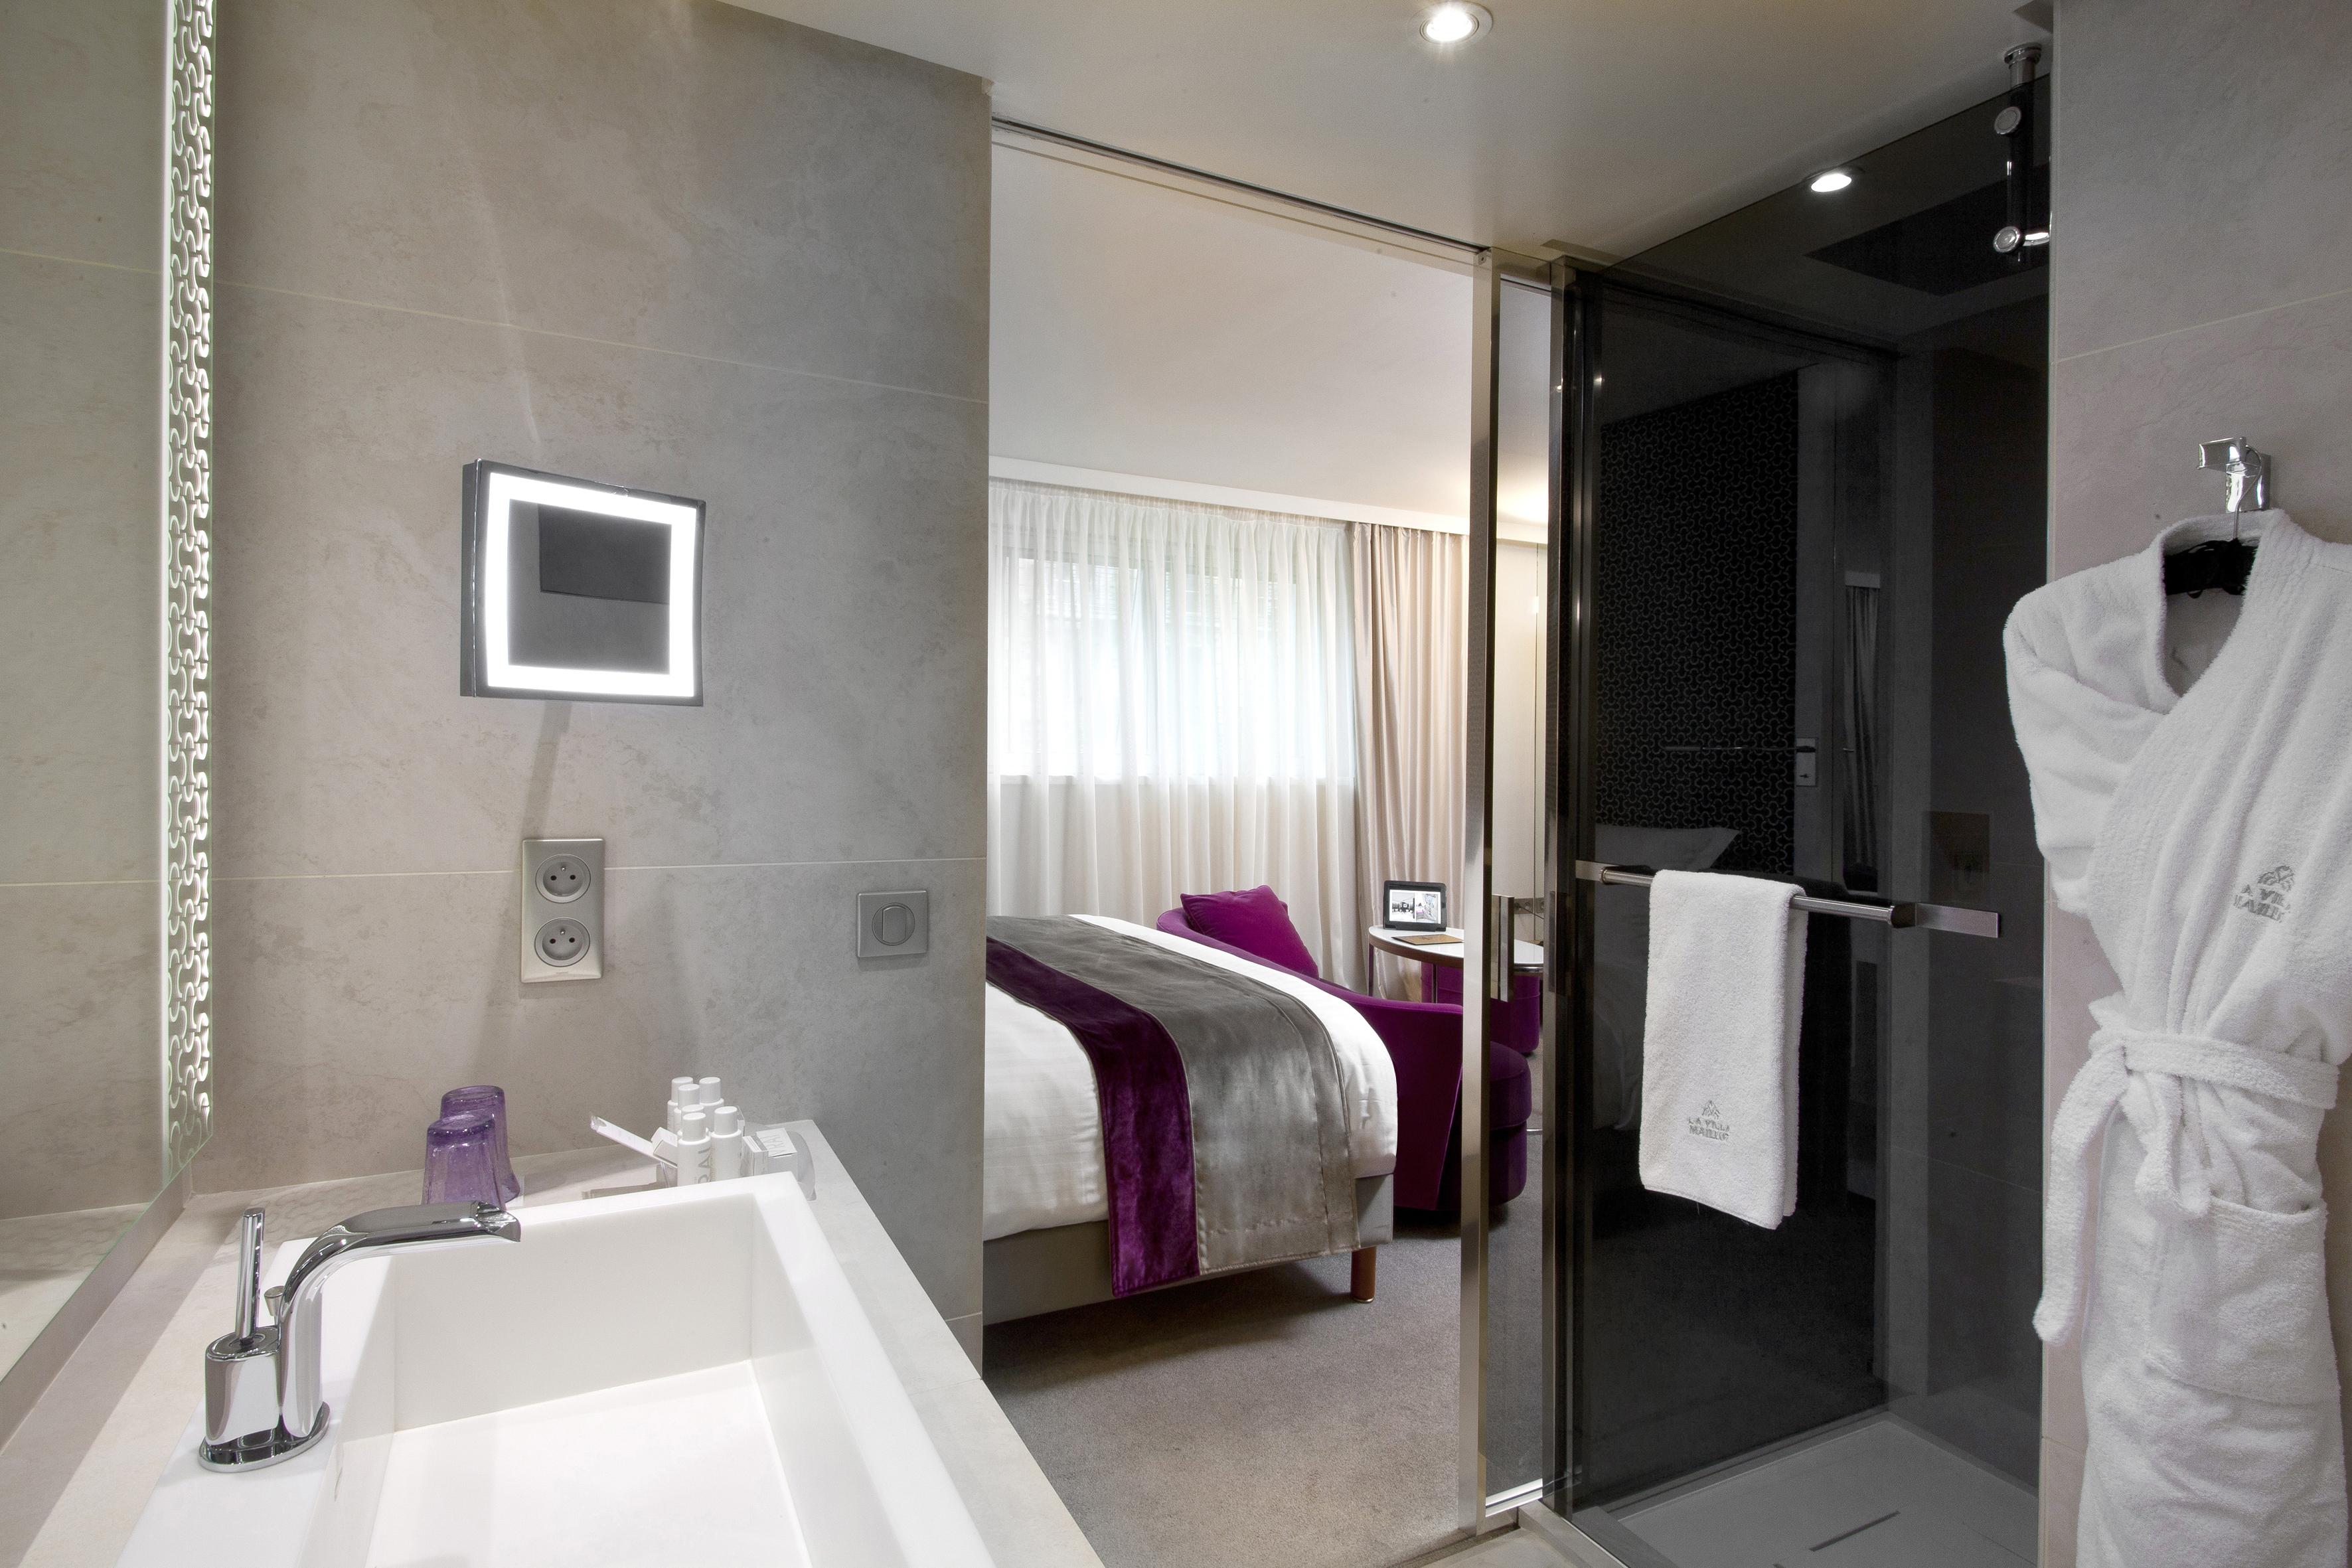 salle de bains deluxe la villa maillot spa paris luxsure. Black Bedroom Furniture Sets. Home Design Ideas